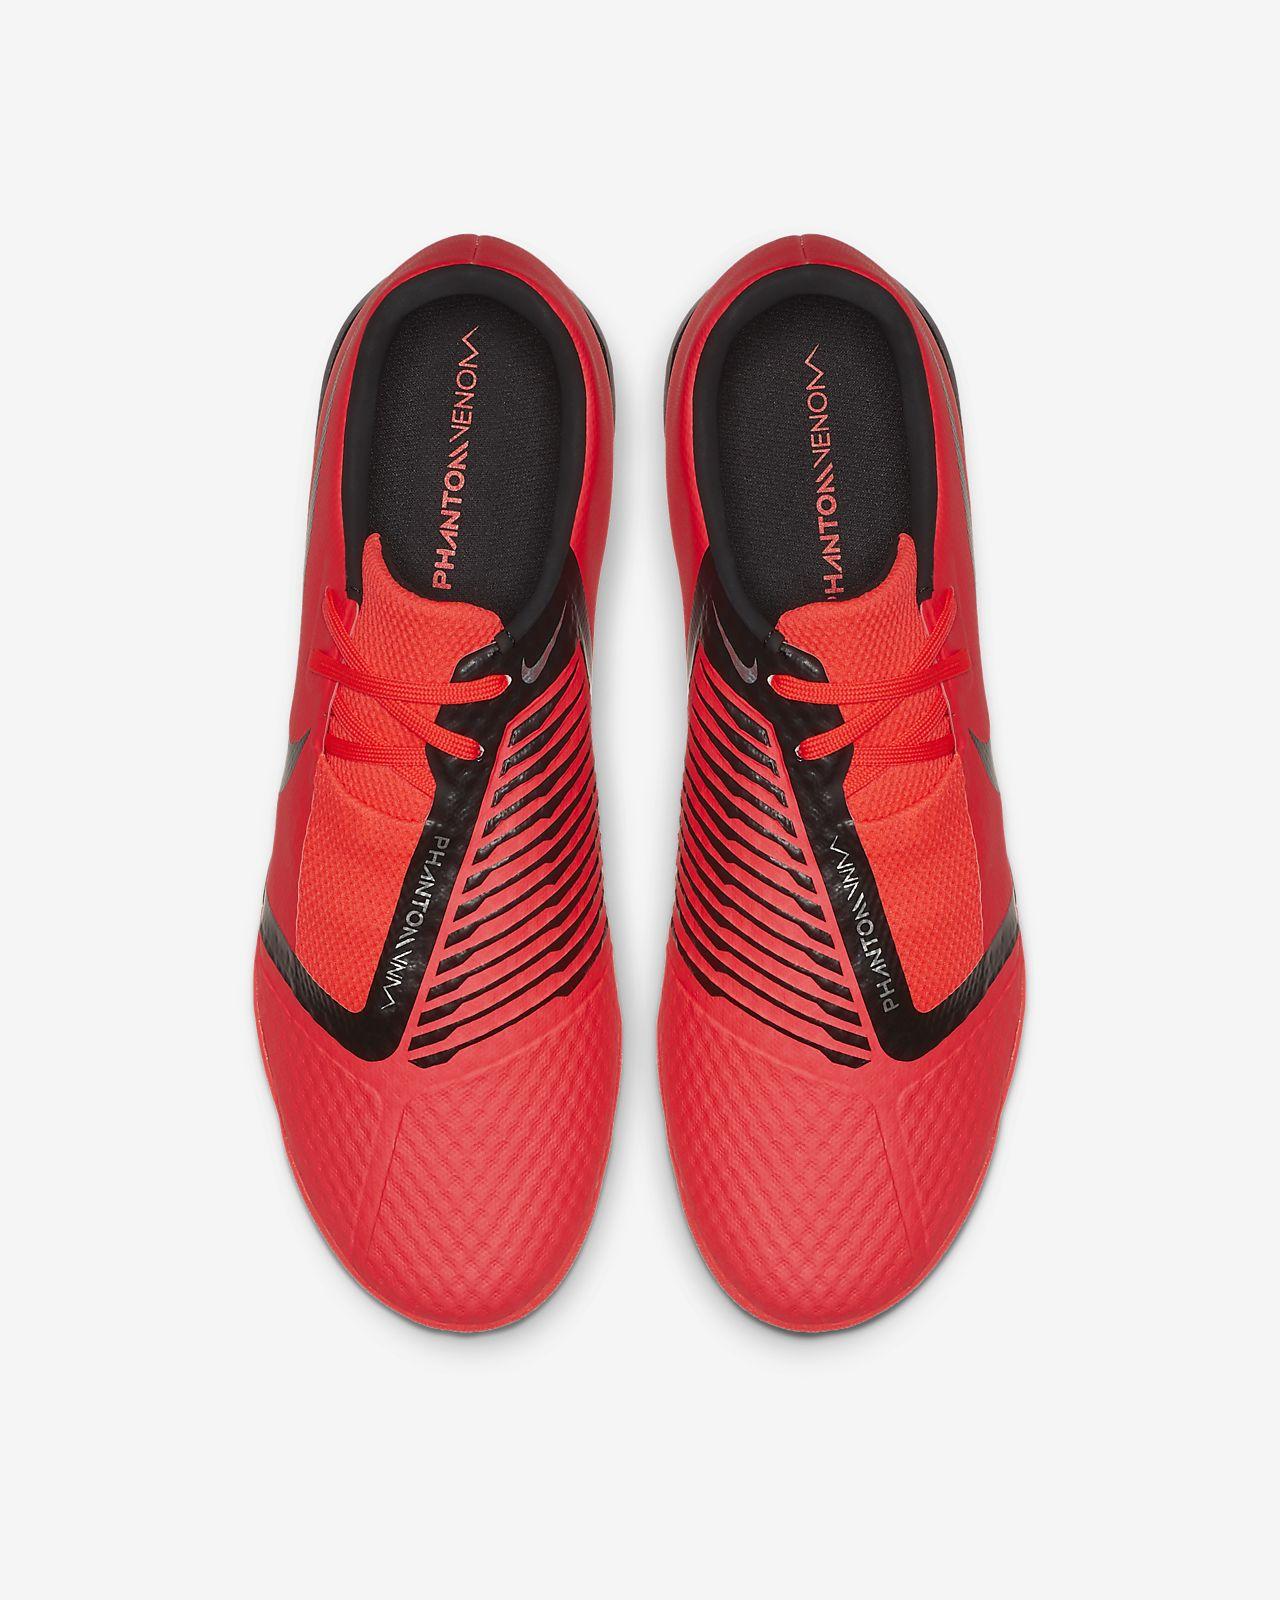 d079f4eeb4 Nike PhantomVNM Academy TF Game Over Turf Football Shoe. Nike.com NO